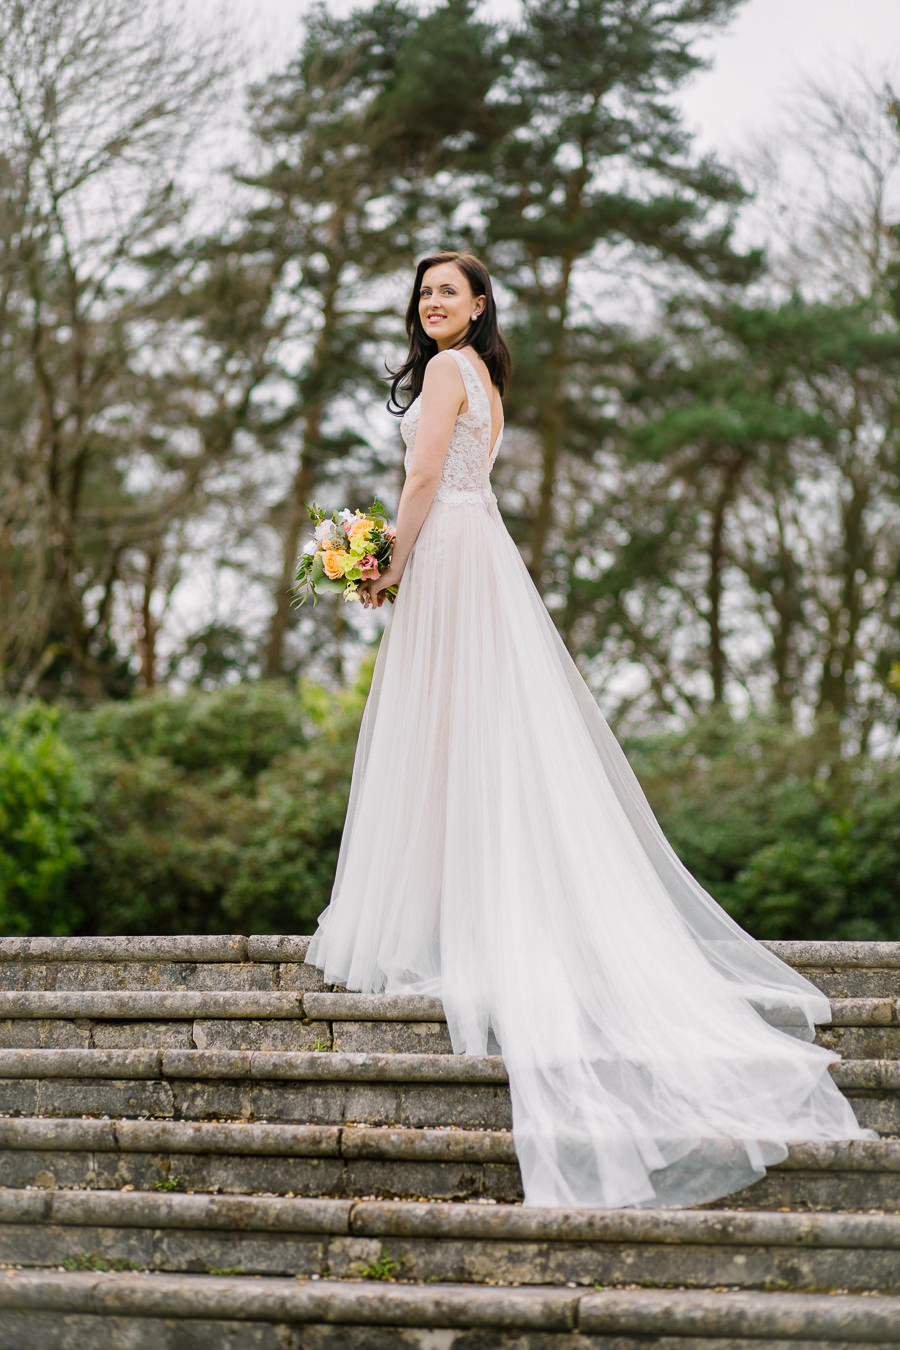 'Understated Elegance' Spring Styled Hampshire Bridal Shoot – Rownhams House, photo credit Nisha Haq Photography (17)